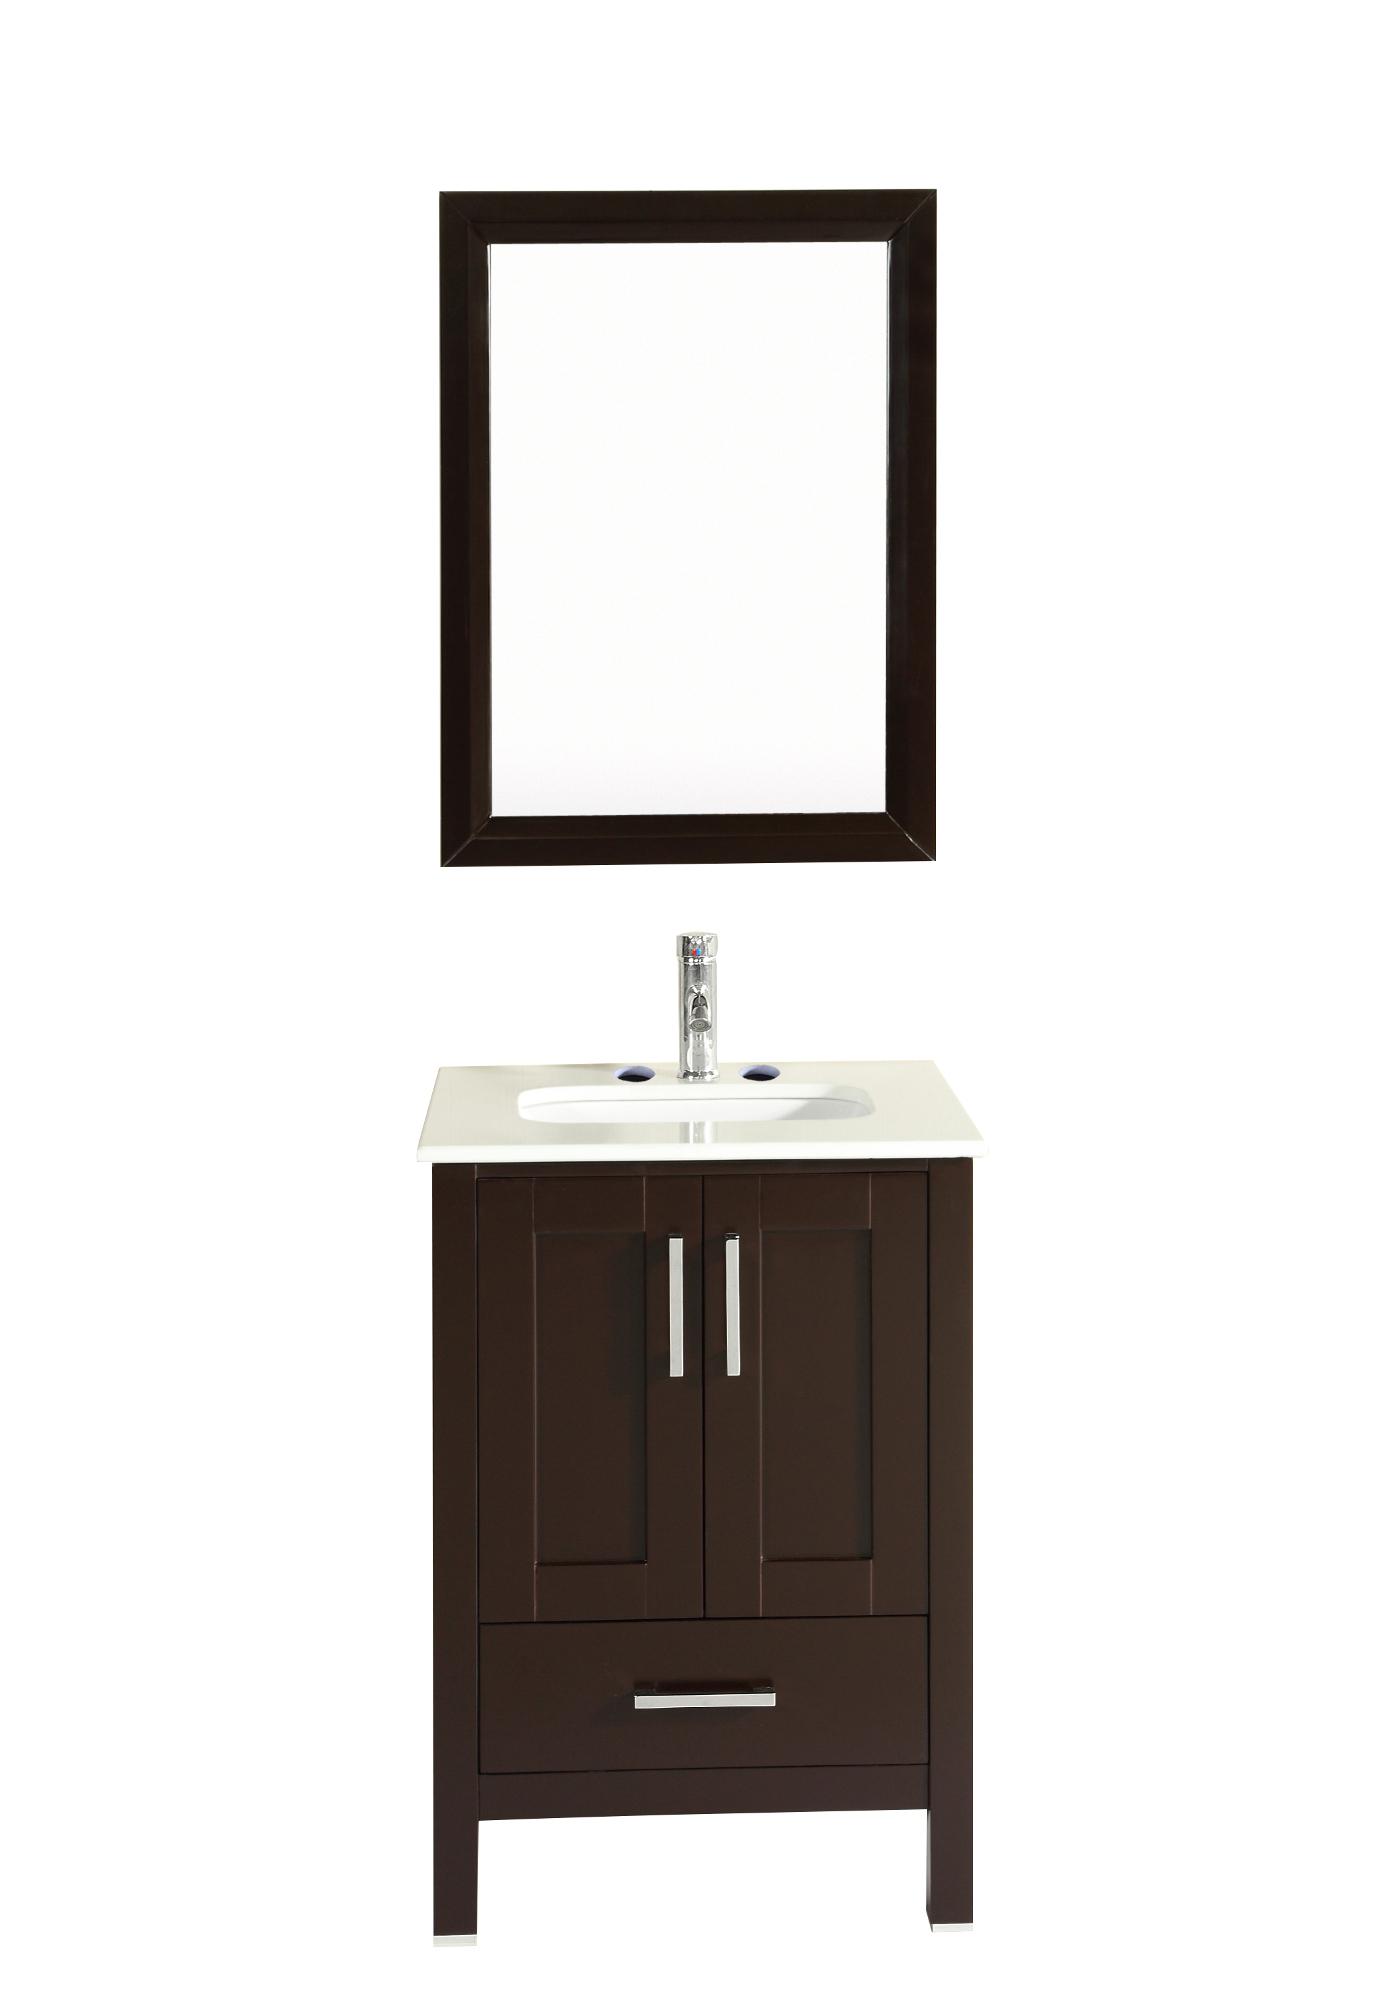 "TVN299 24ES A Main - Totti Shaker 24"" Transitional Espresso Bathroom Vanity with White Carrera Countertop"